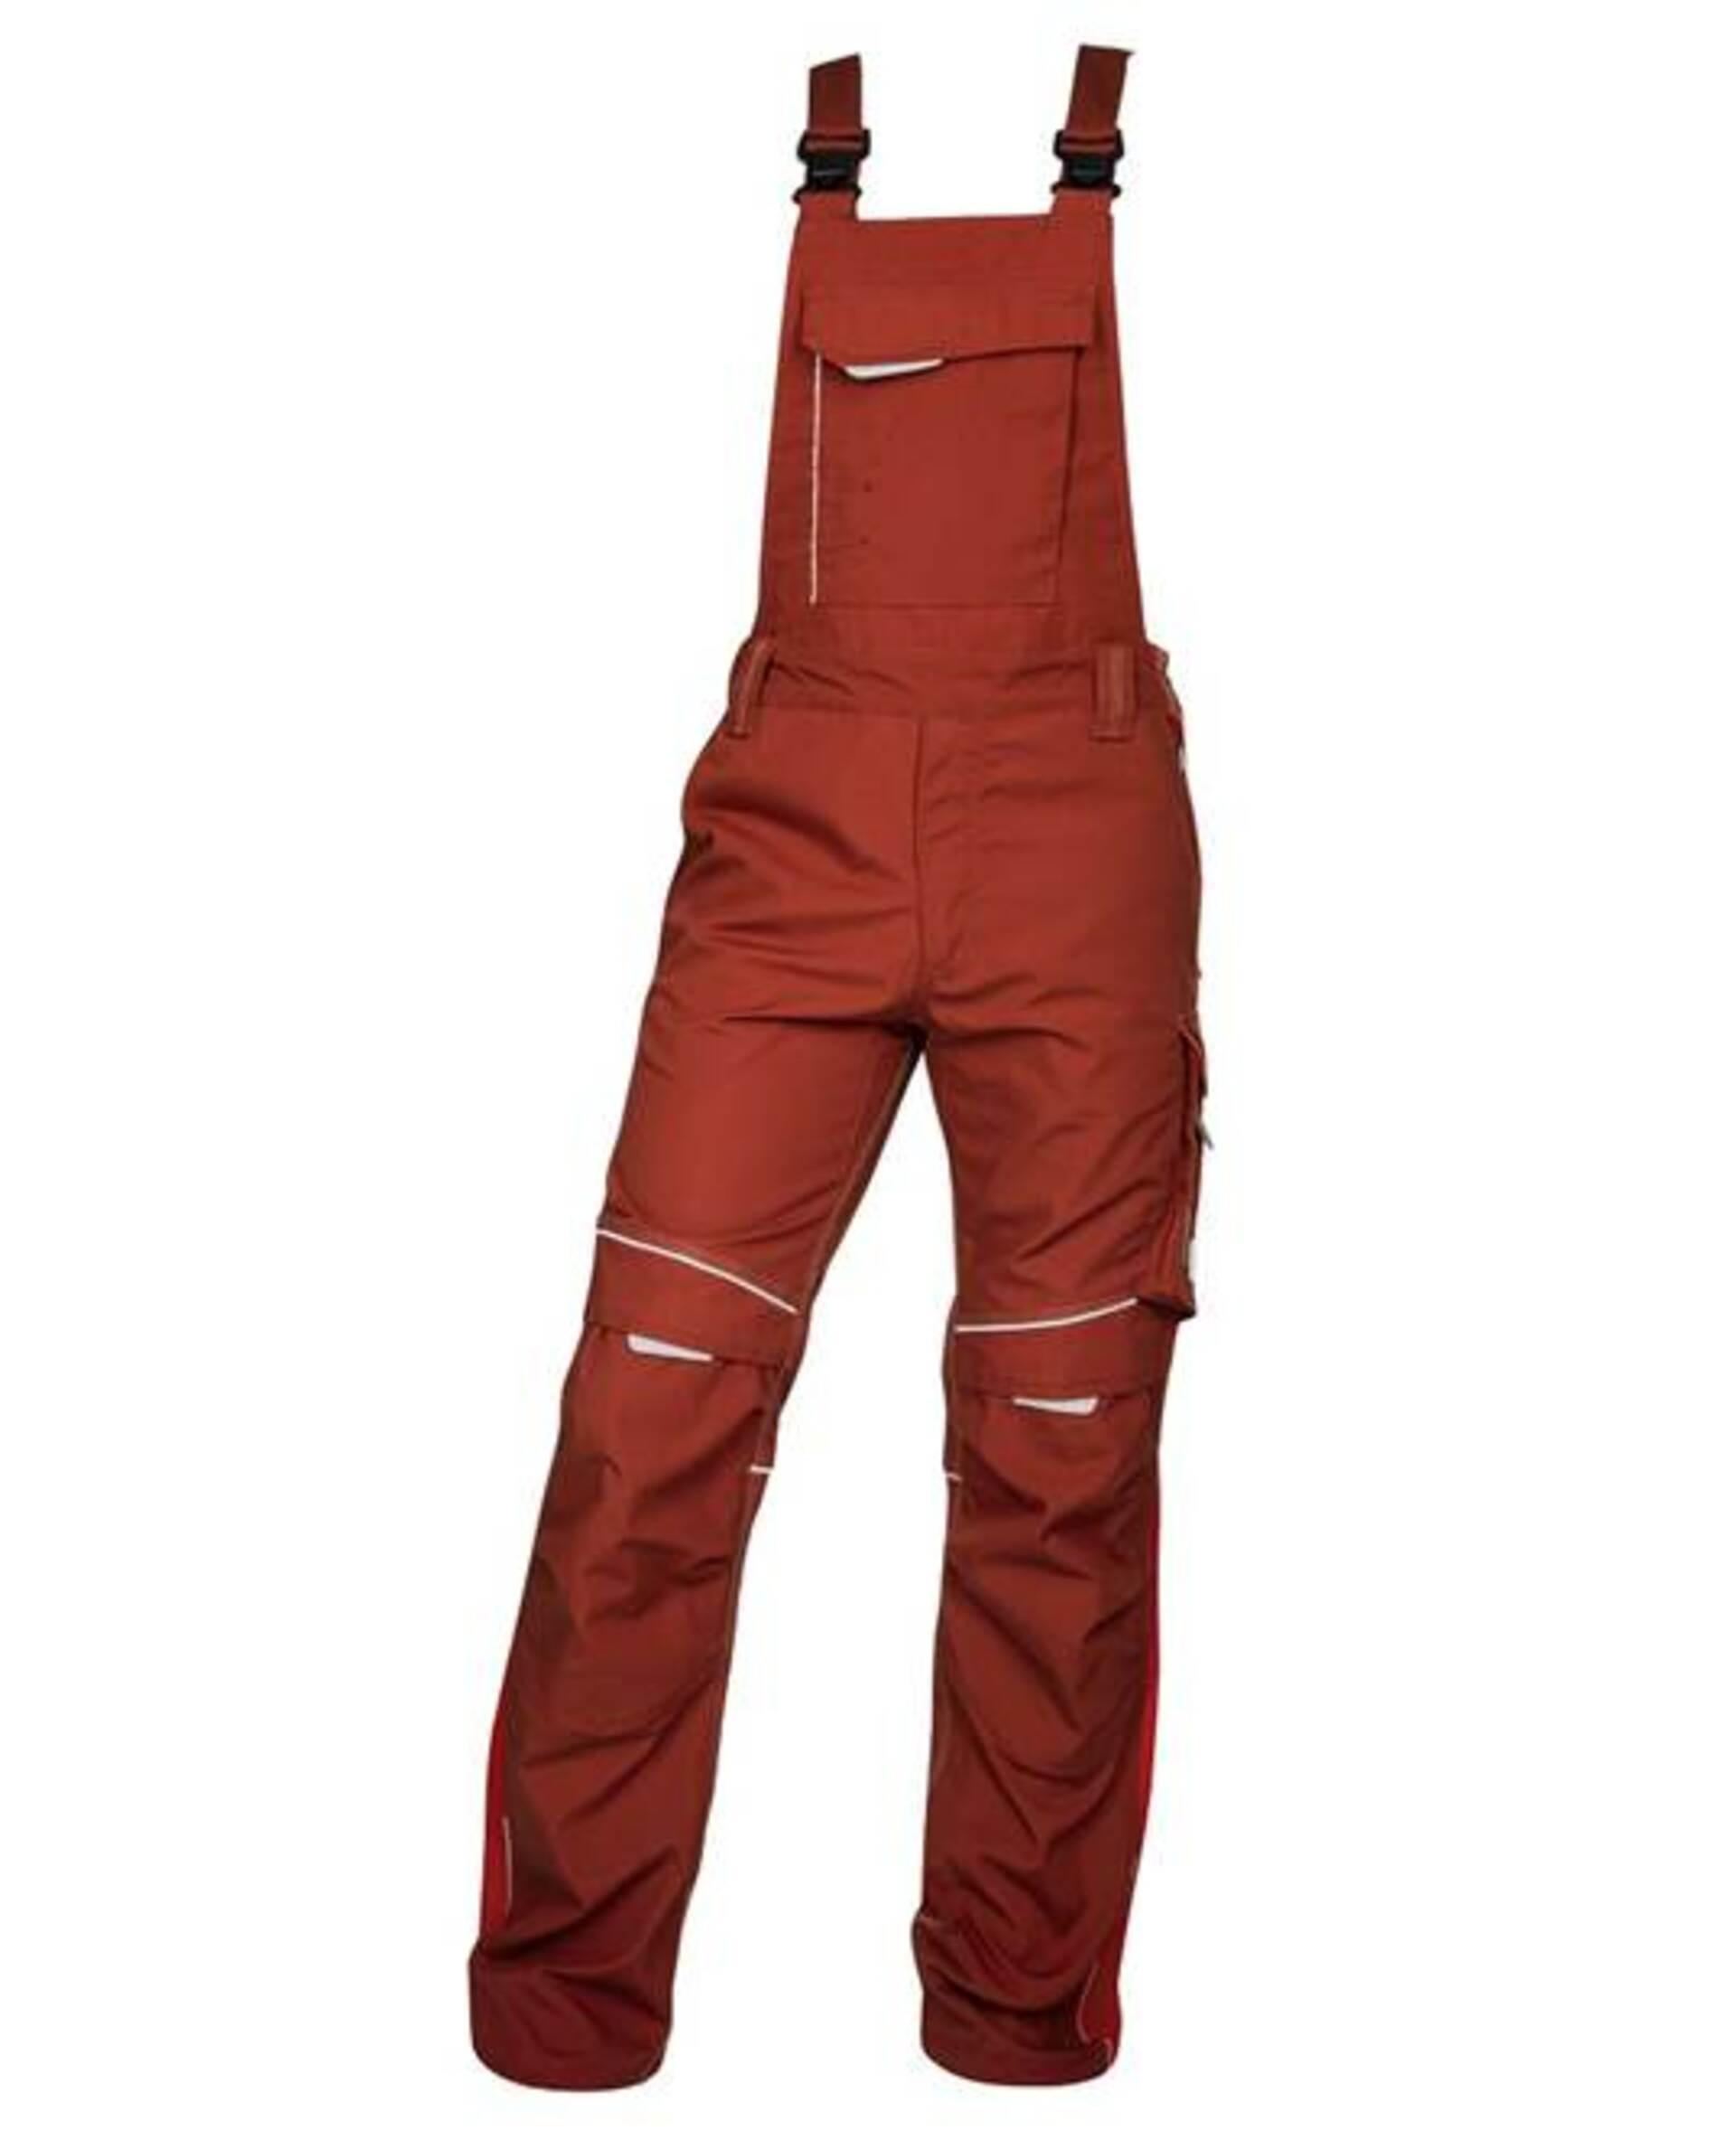 Ardon URBAN Kalhoty s laclem červená 182 50